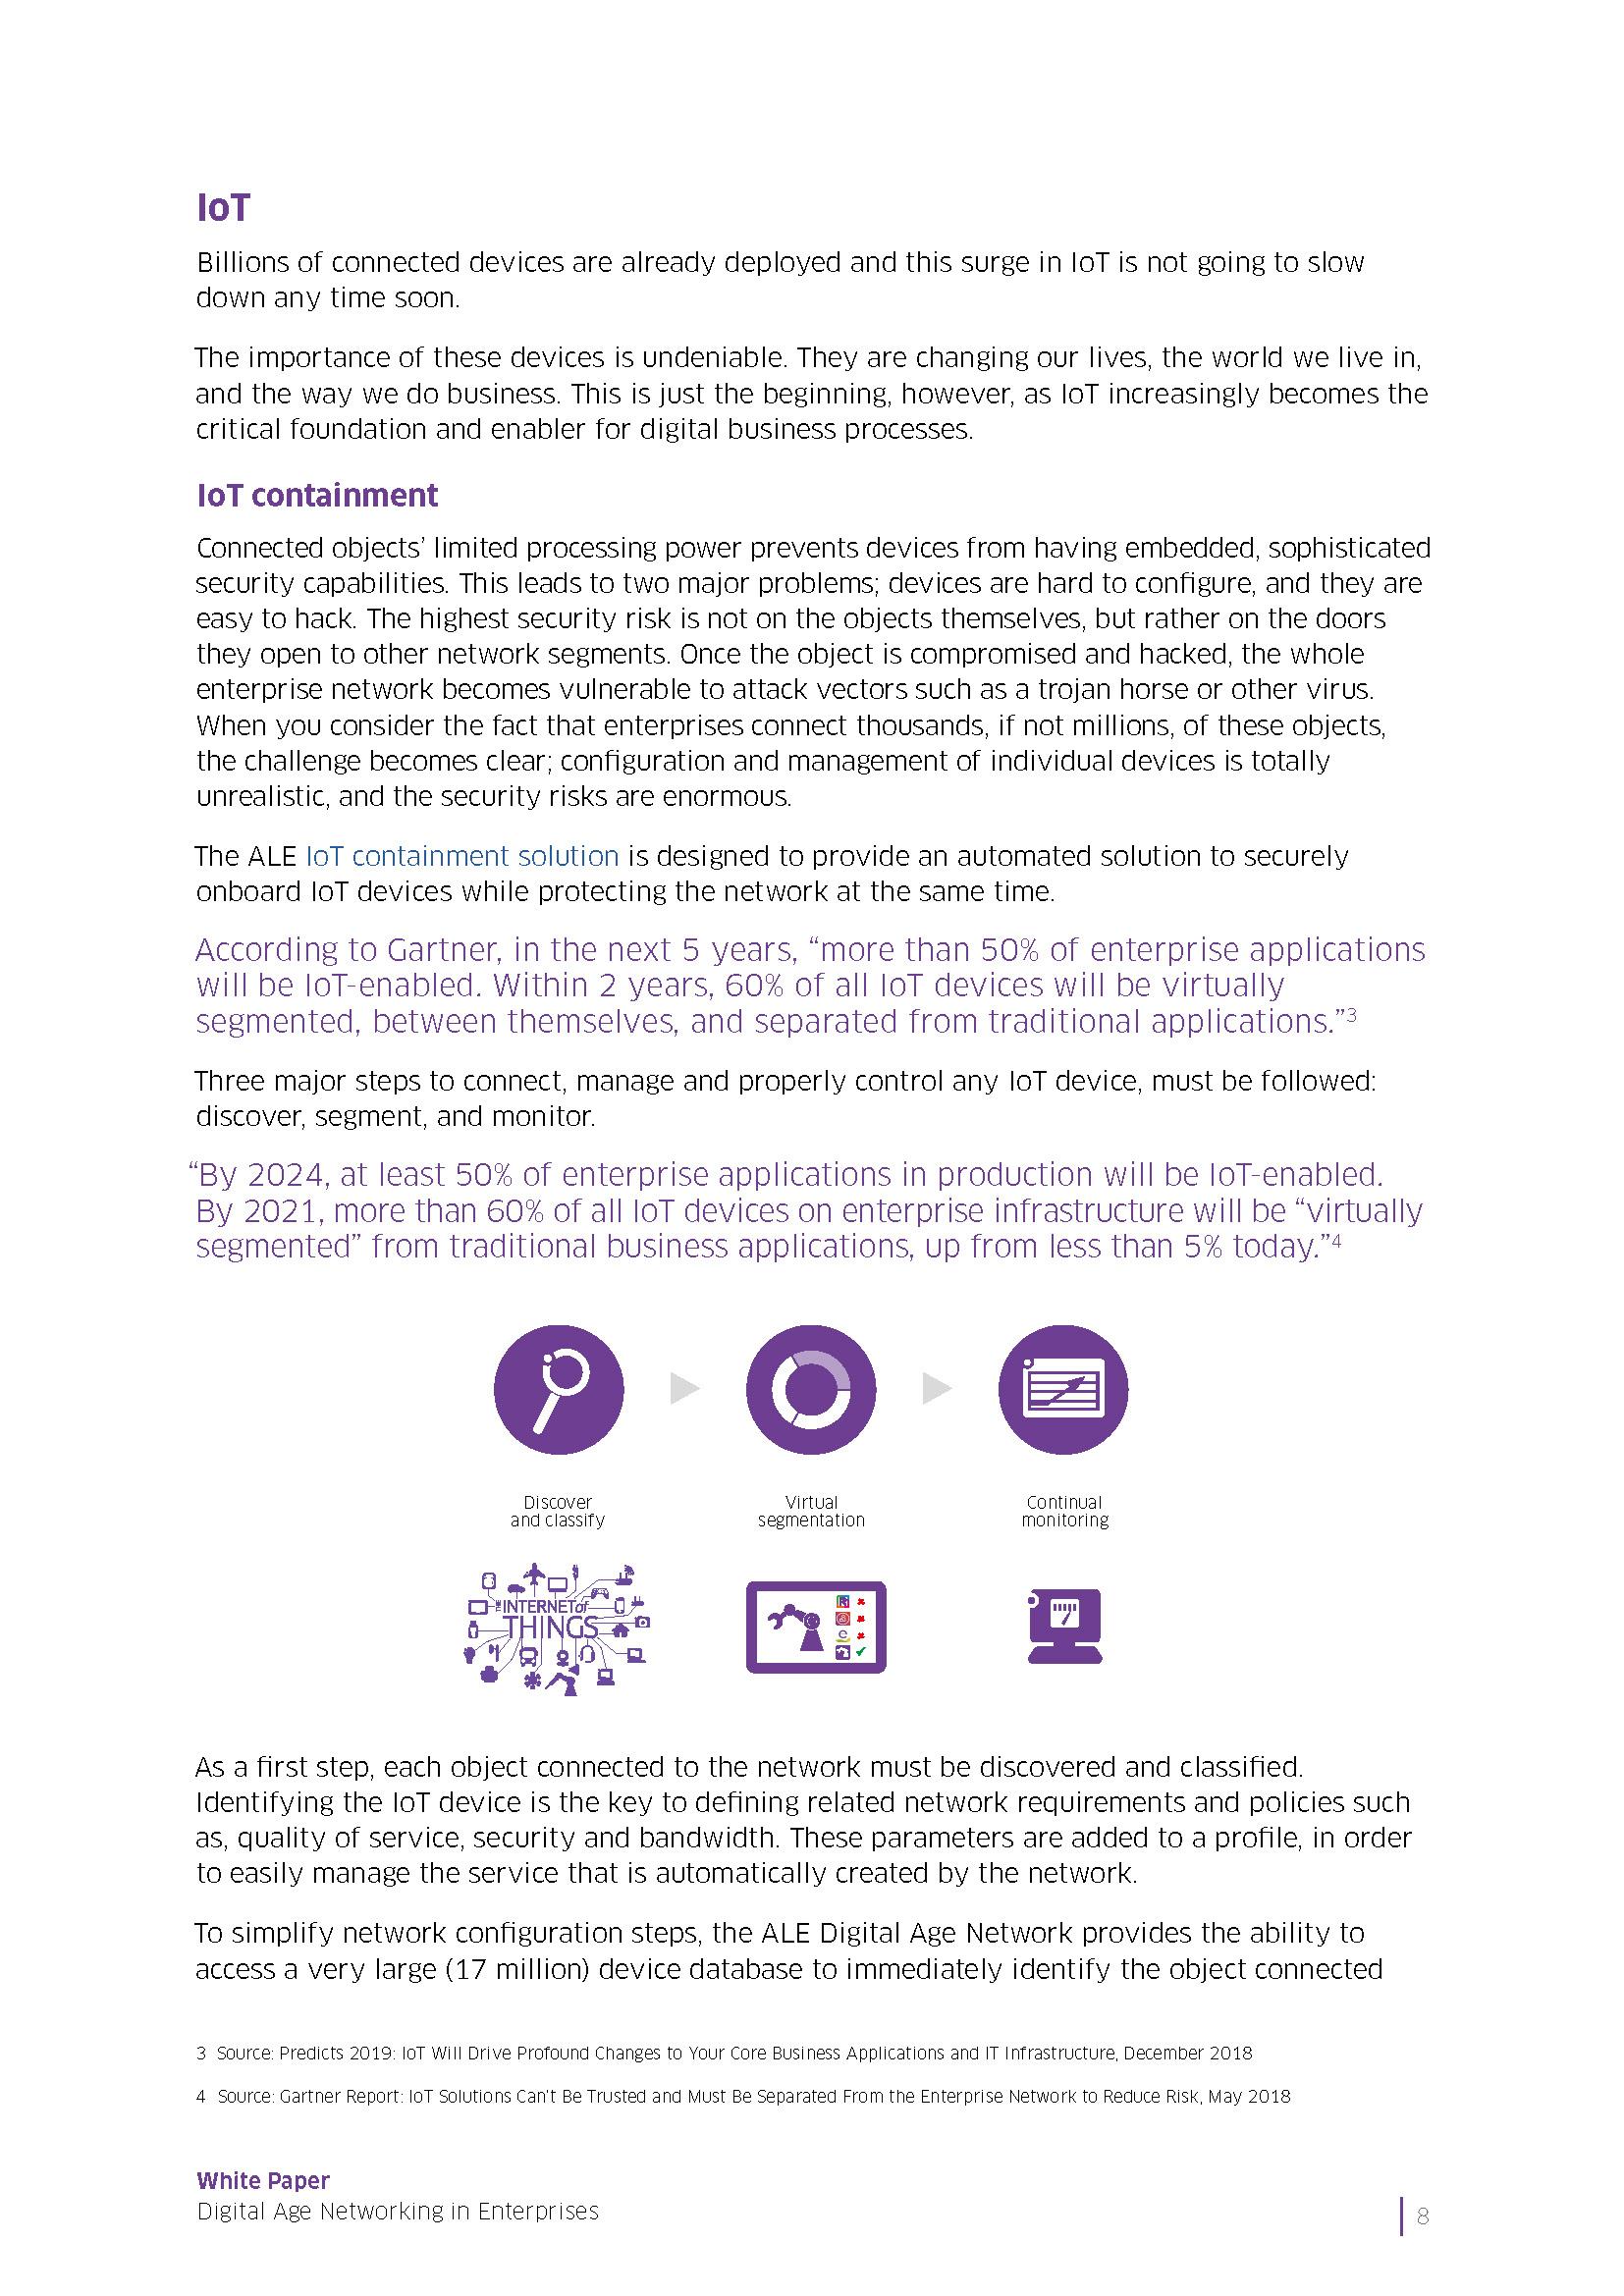 digital-age-networking-enterprises_Page_08